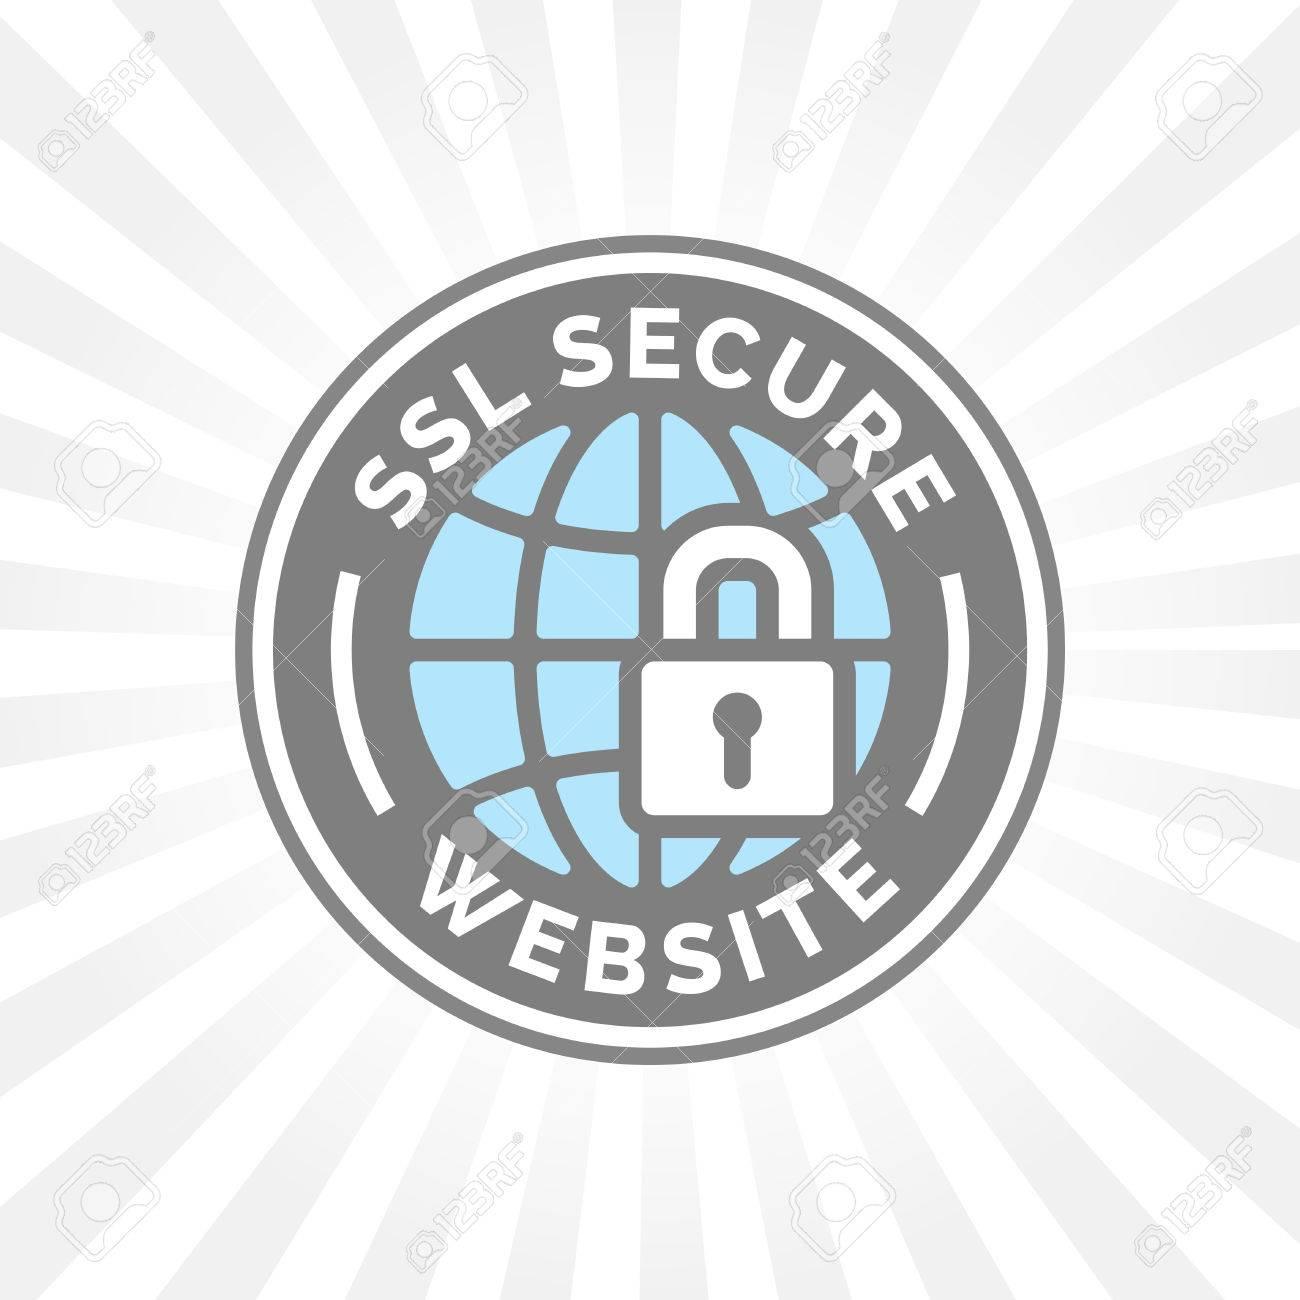 Secure website icon. Global internet web security sign. SSL symbol. Grey and blue globe with padlock emblem. - 65019703